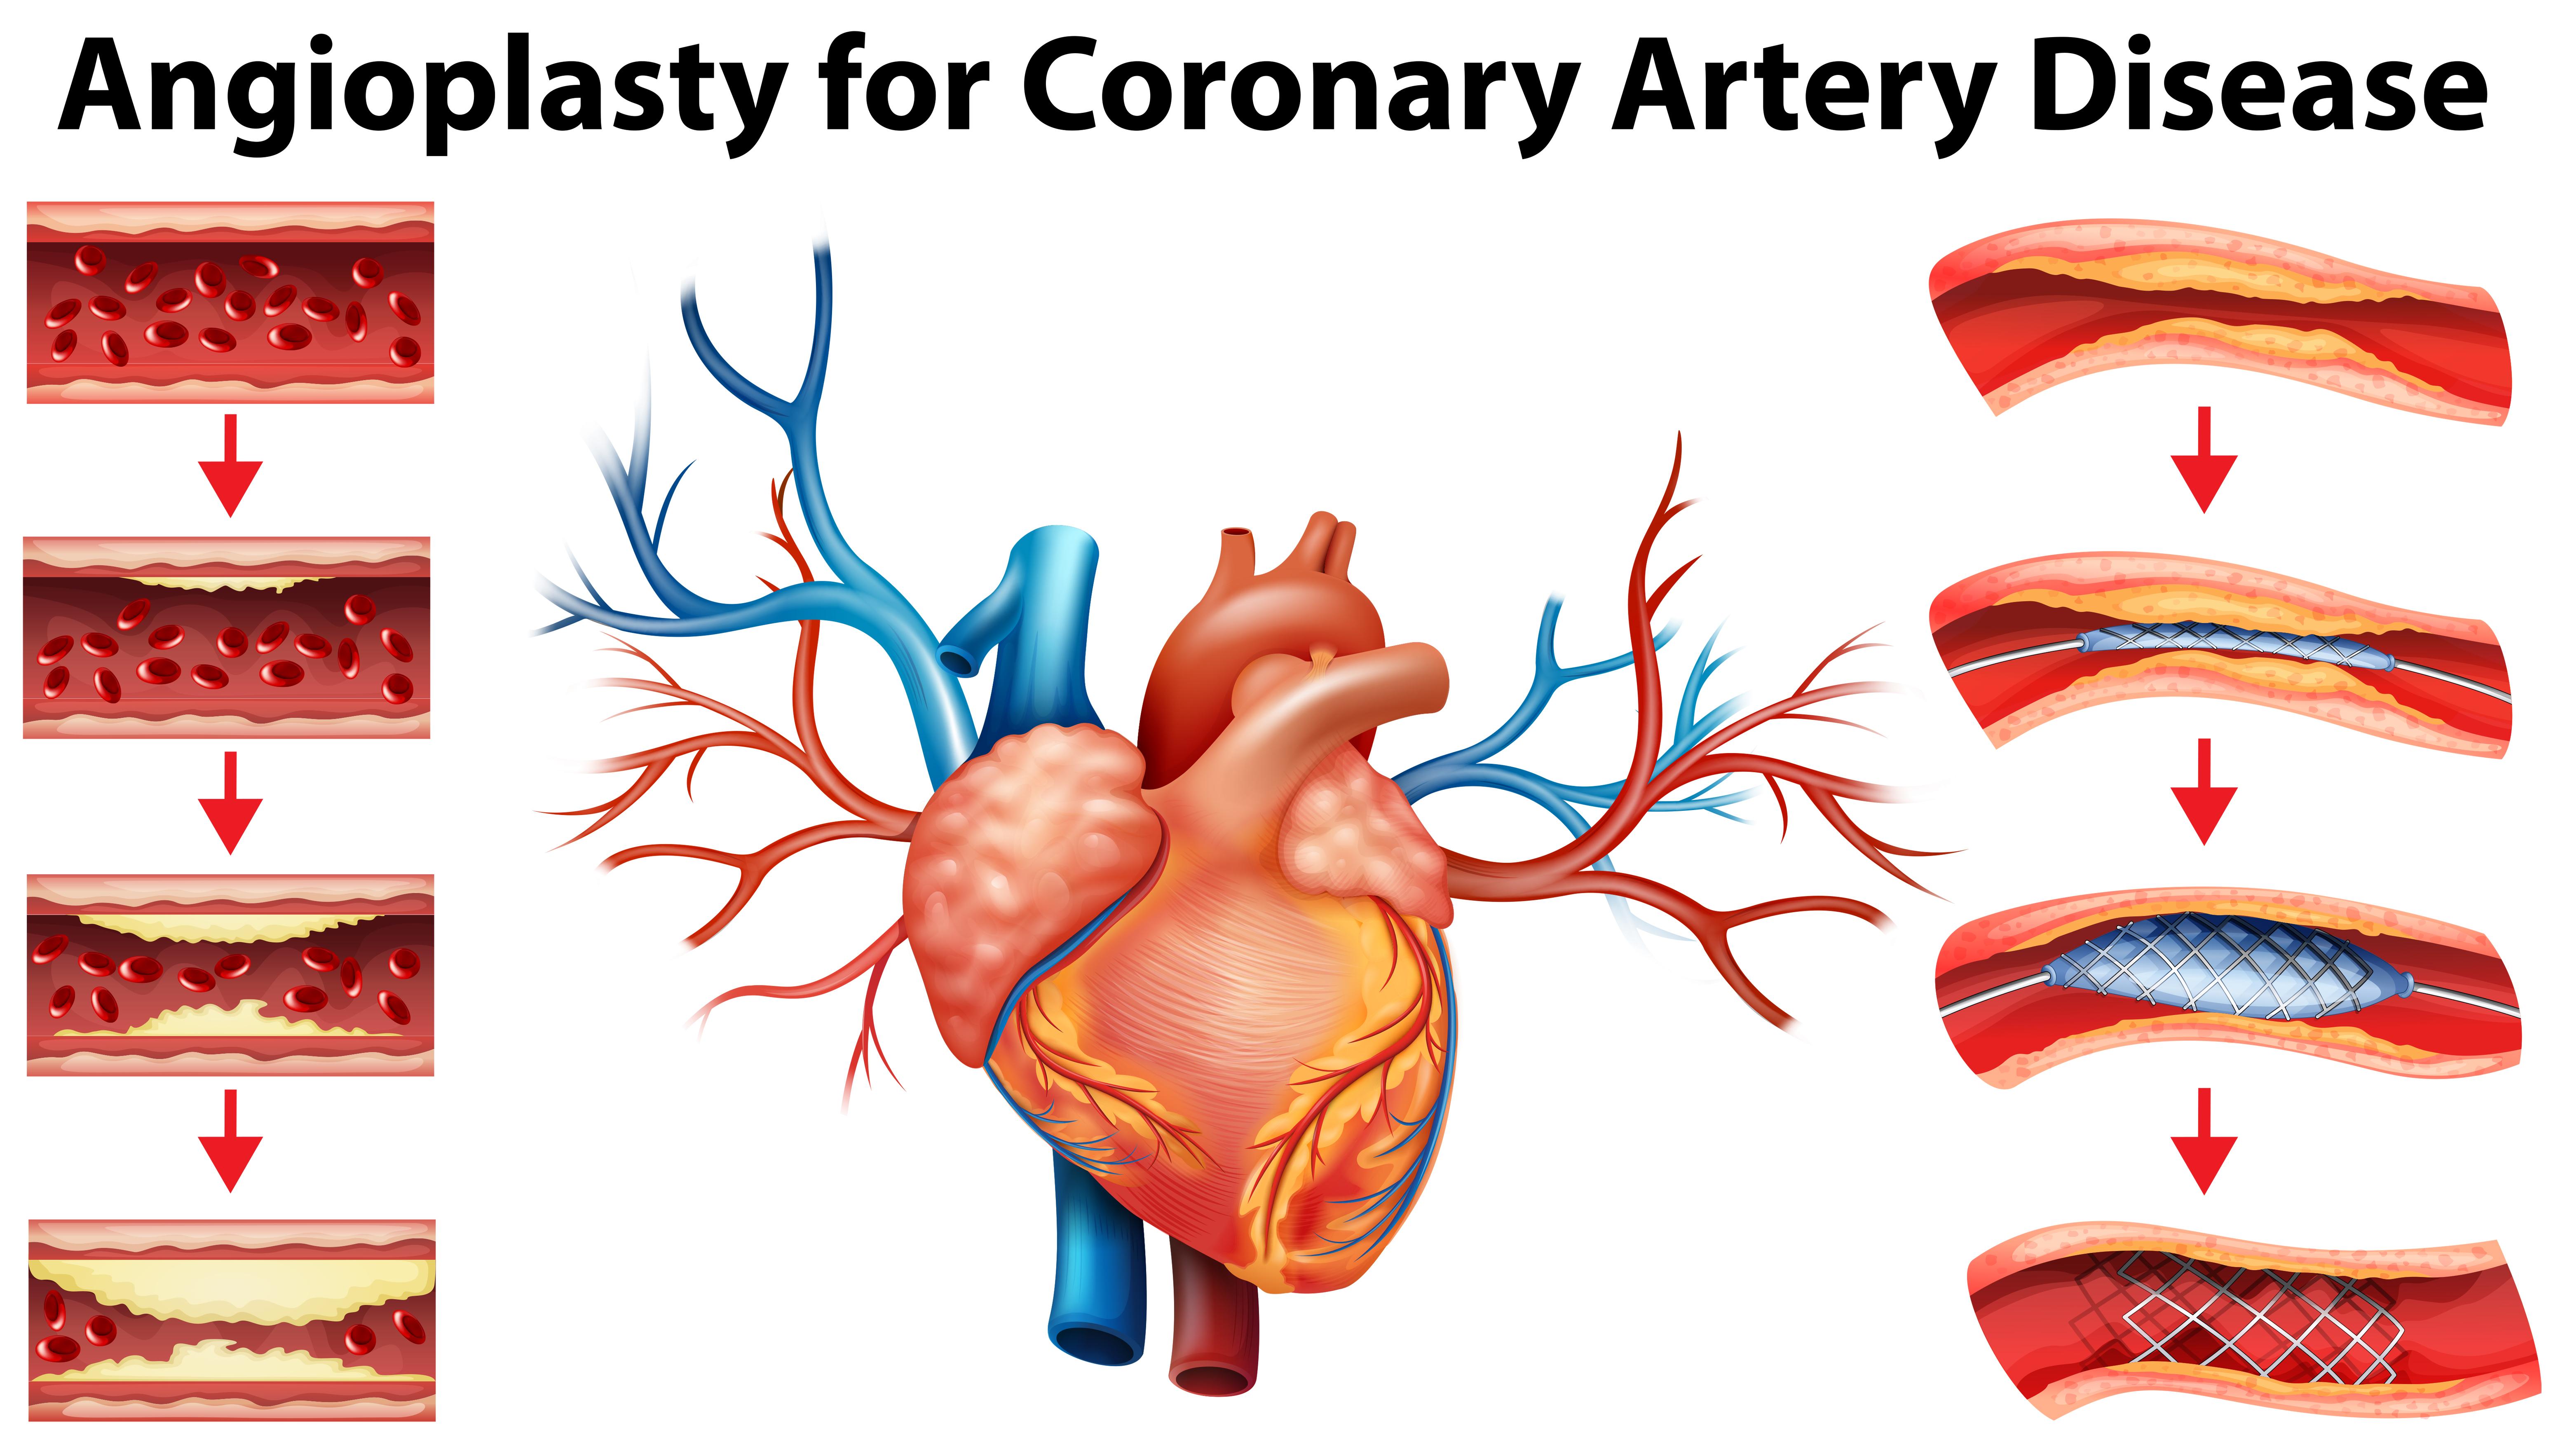 Diagram showing angioplasty for coronary artery disease ...